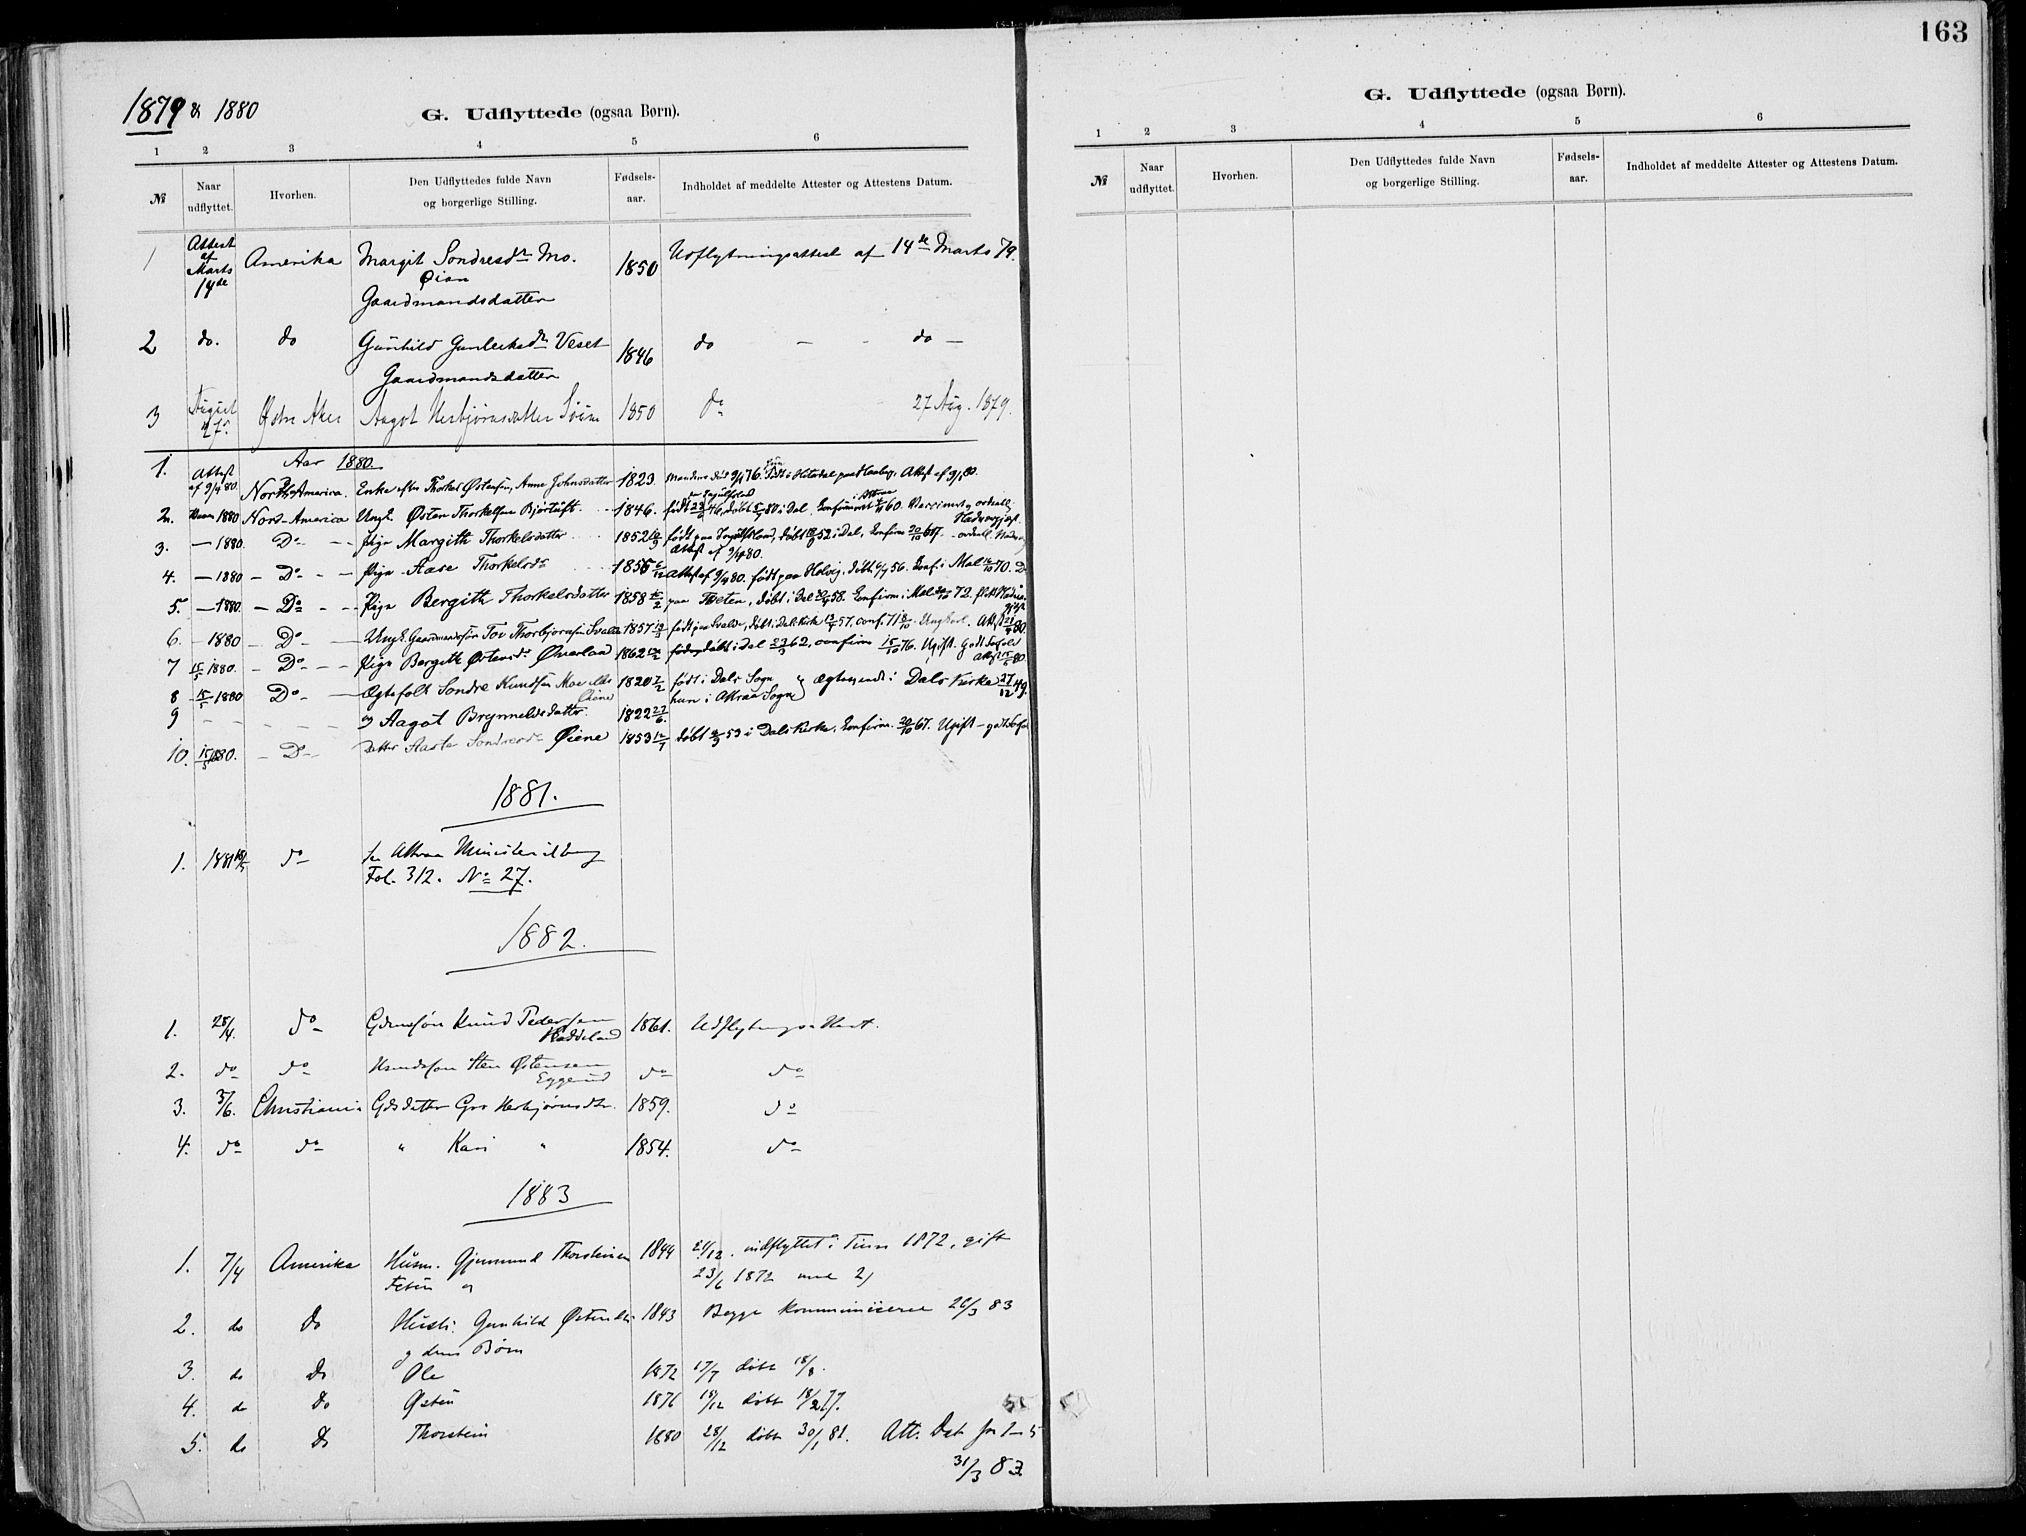 SAKO, Rjukan kirkebøker, F/Fa/L0001: Ministerialbok nr. 1, 1878-1912, s. 163